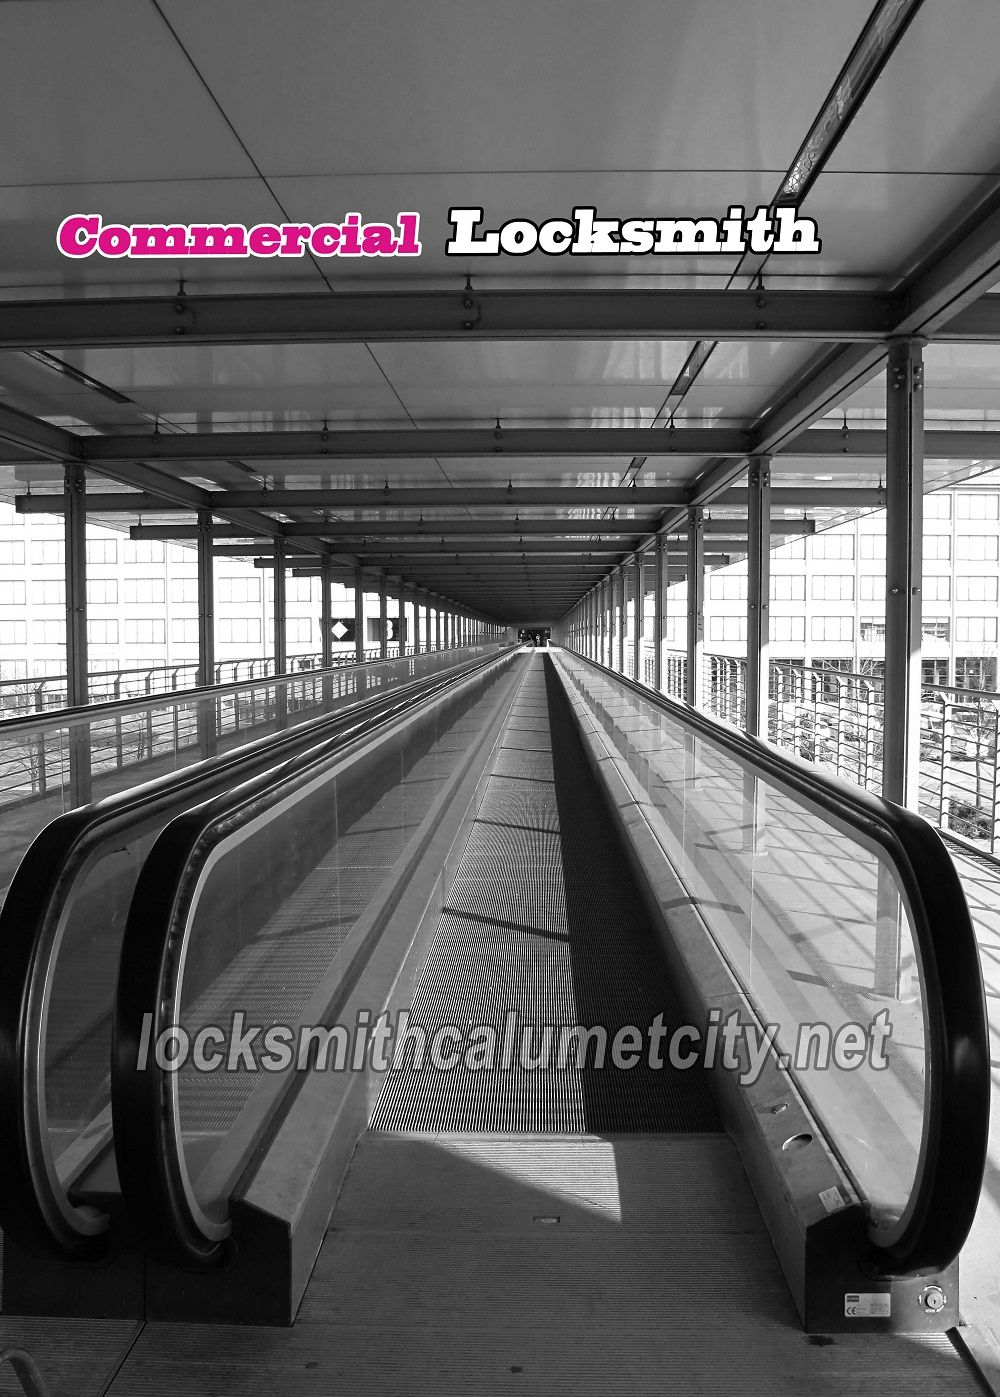 Commercial Locksmith Services Locksmith, Calumet city